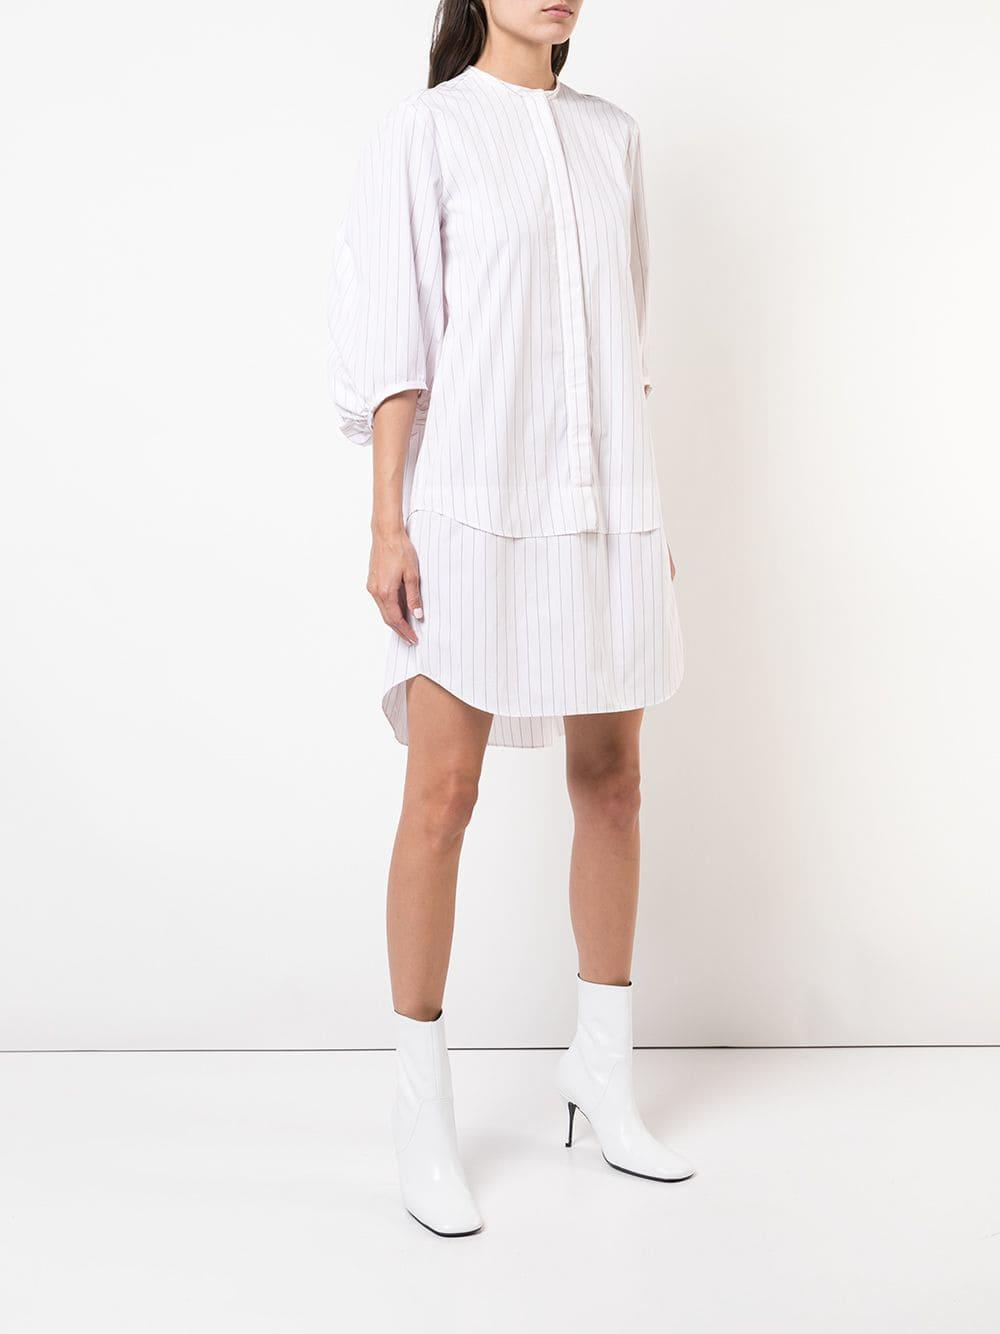 8df7019d9647b Maison Rabih Kayrouz - White Striped Poplin Dress - Lyst. View fullscreen